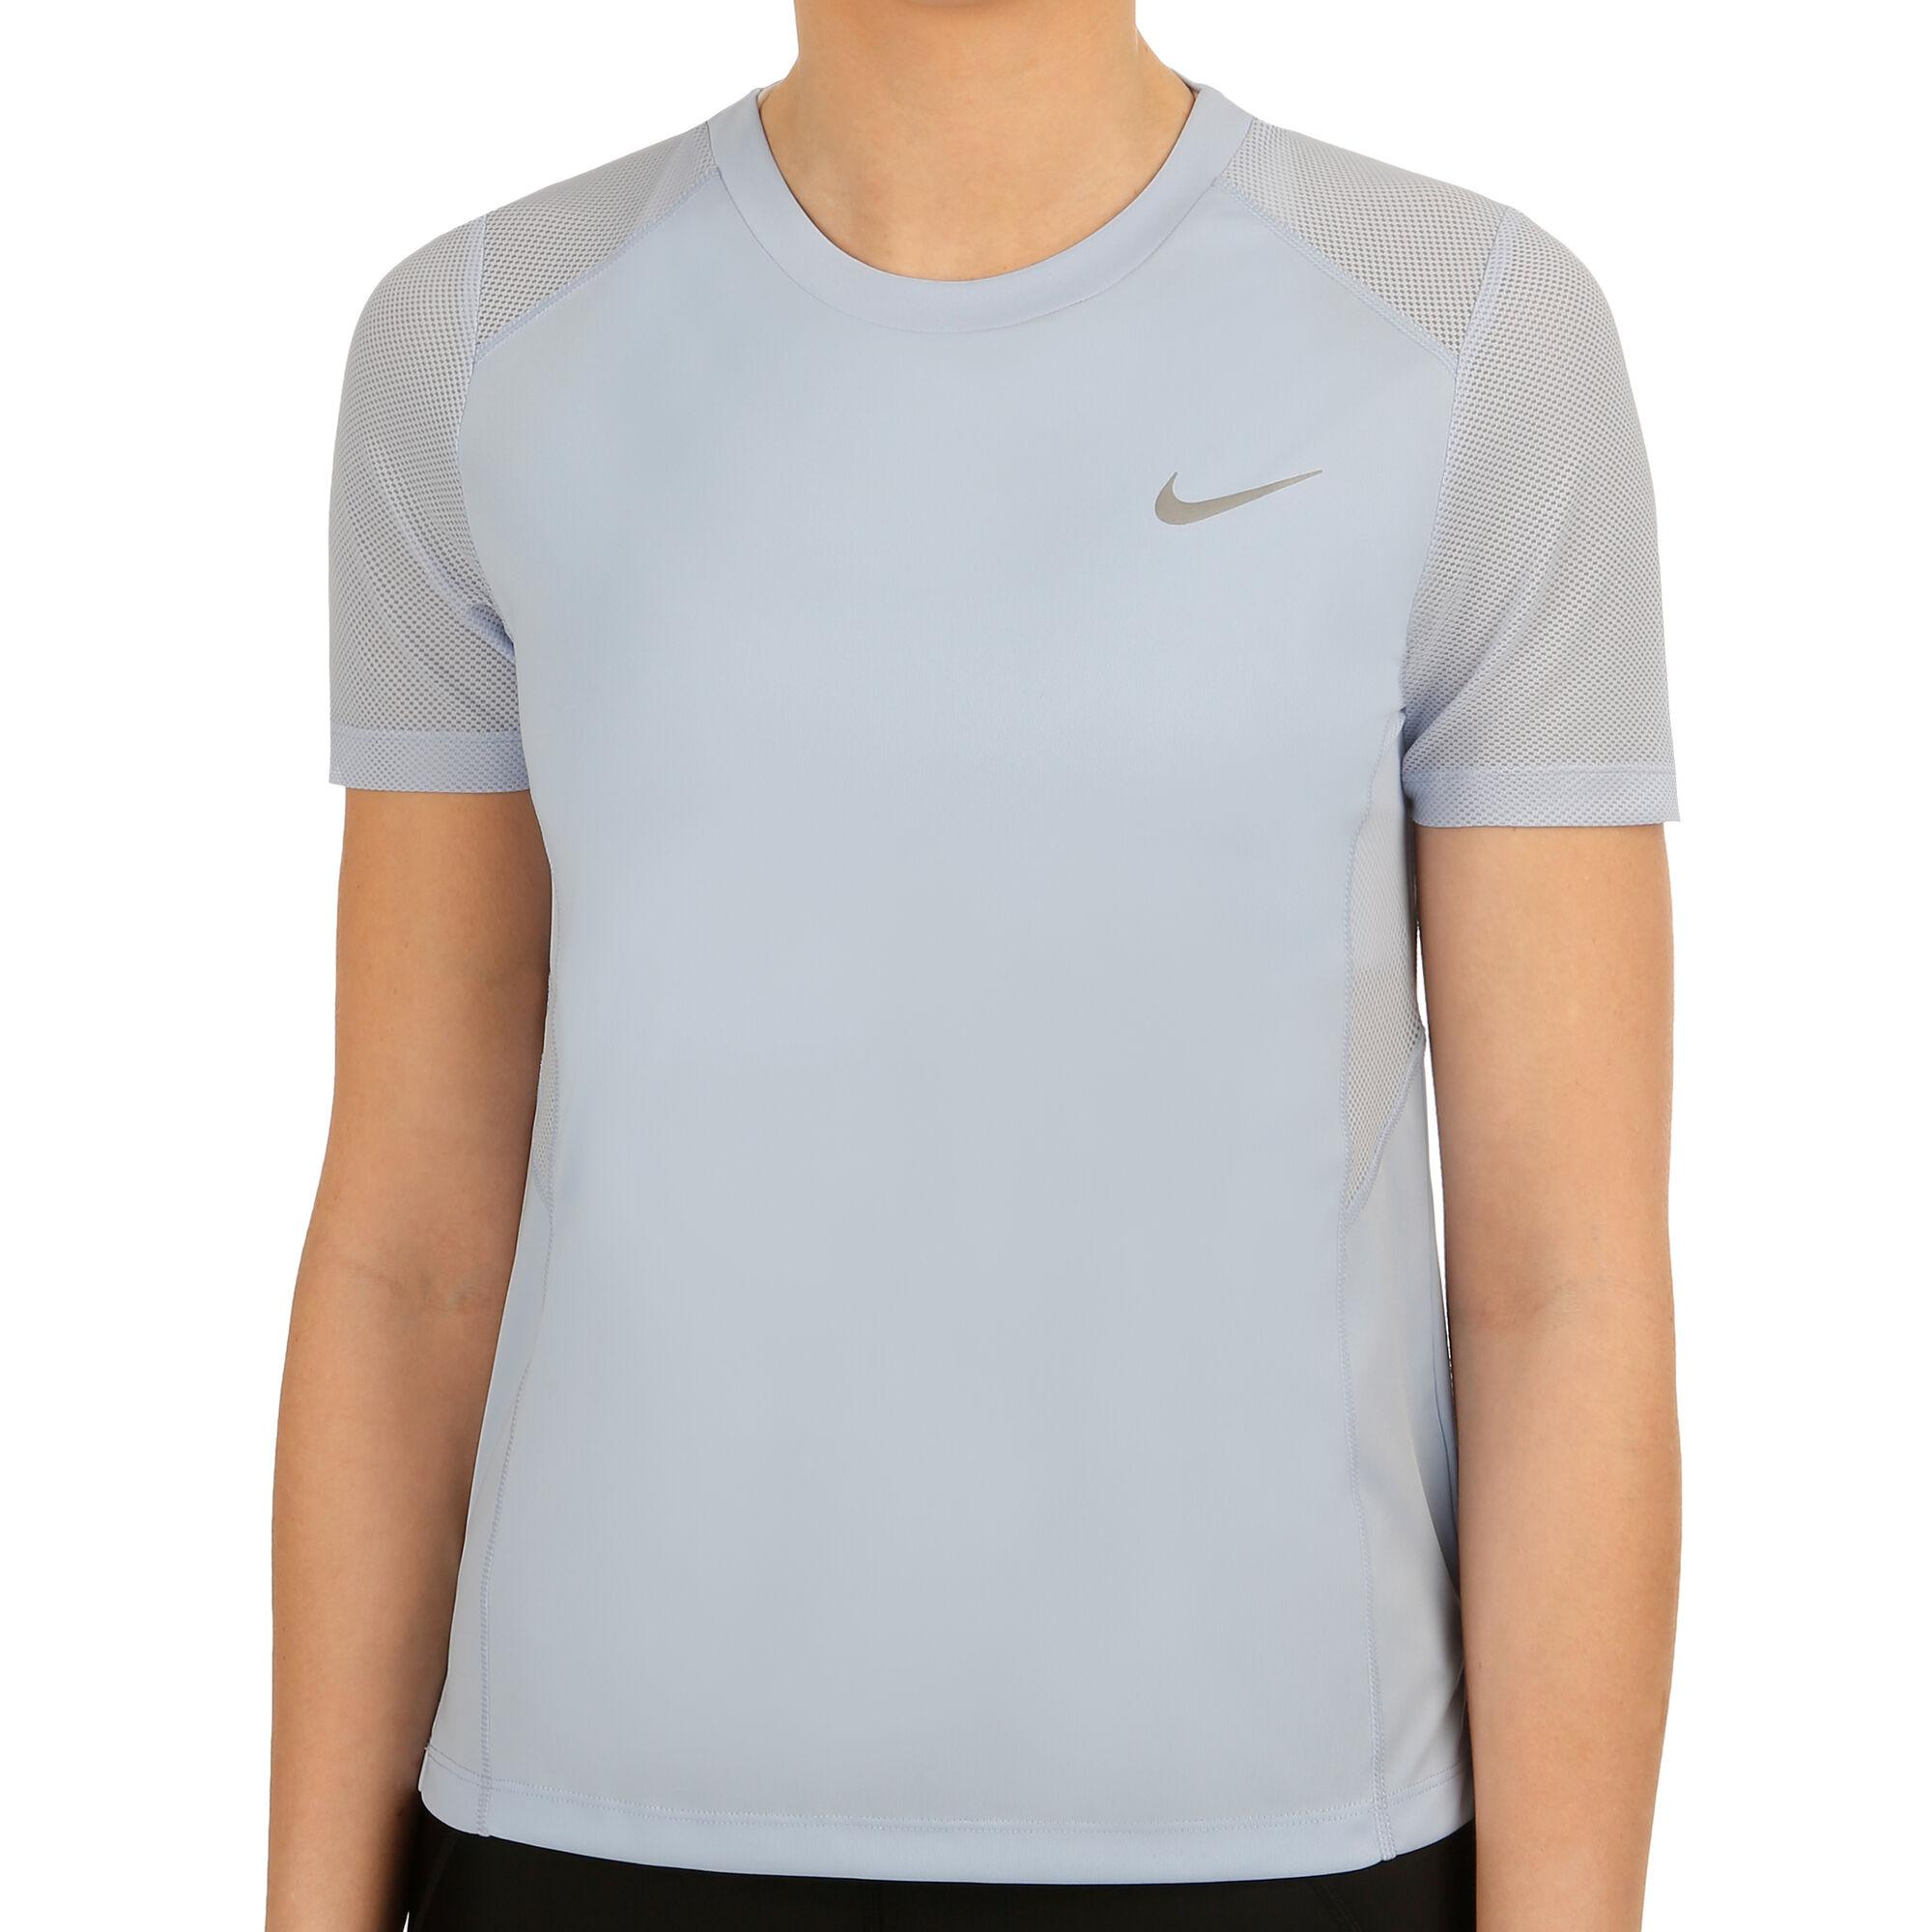 size 40 0a748 b3a0a buy Nike Miler T-Shirt Women - Light Blue, Silver online   Jogging-Point